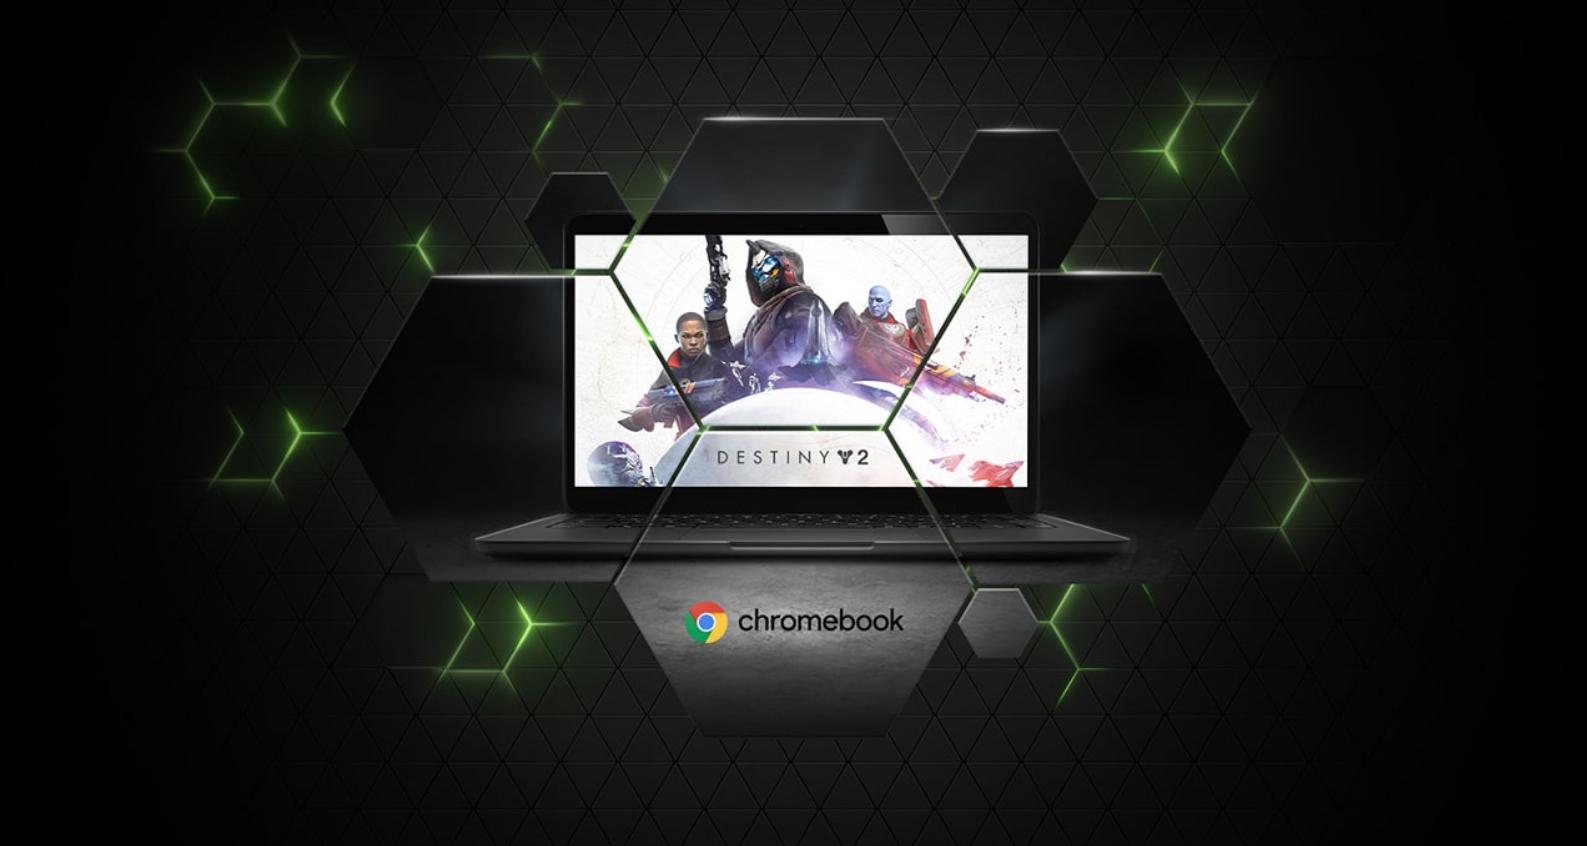 Nvidia Geforce Now Chromebook